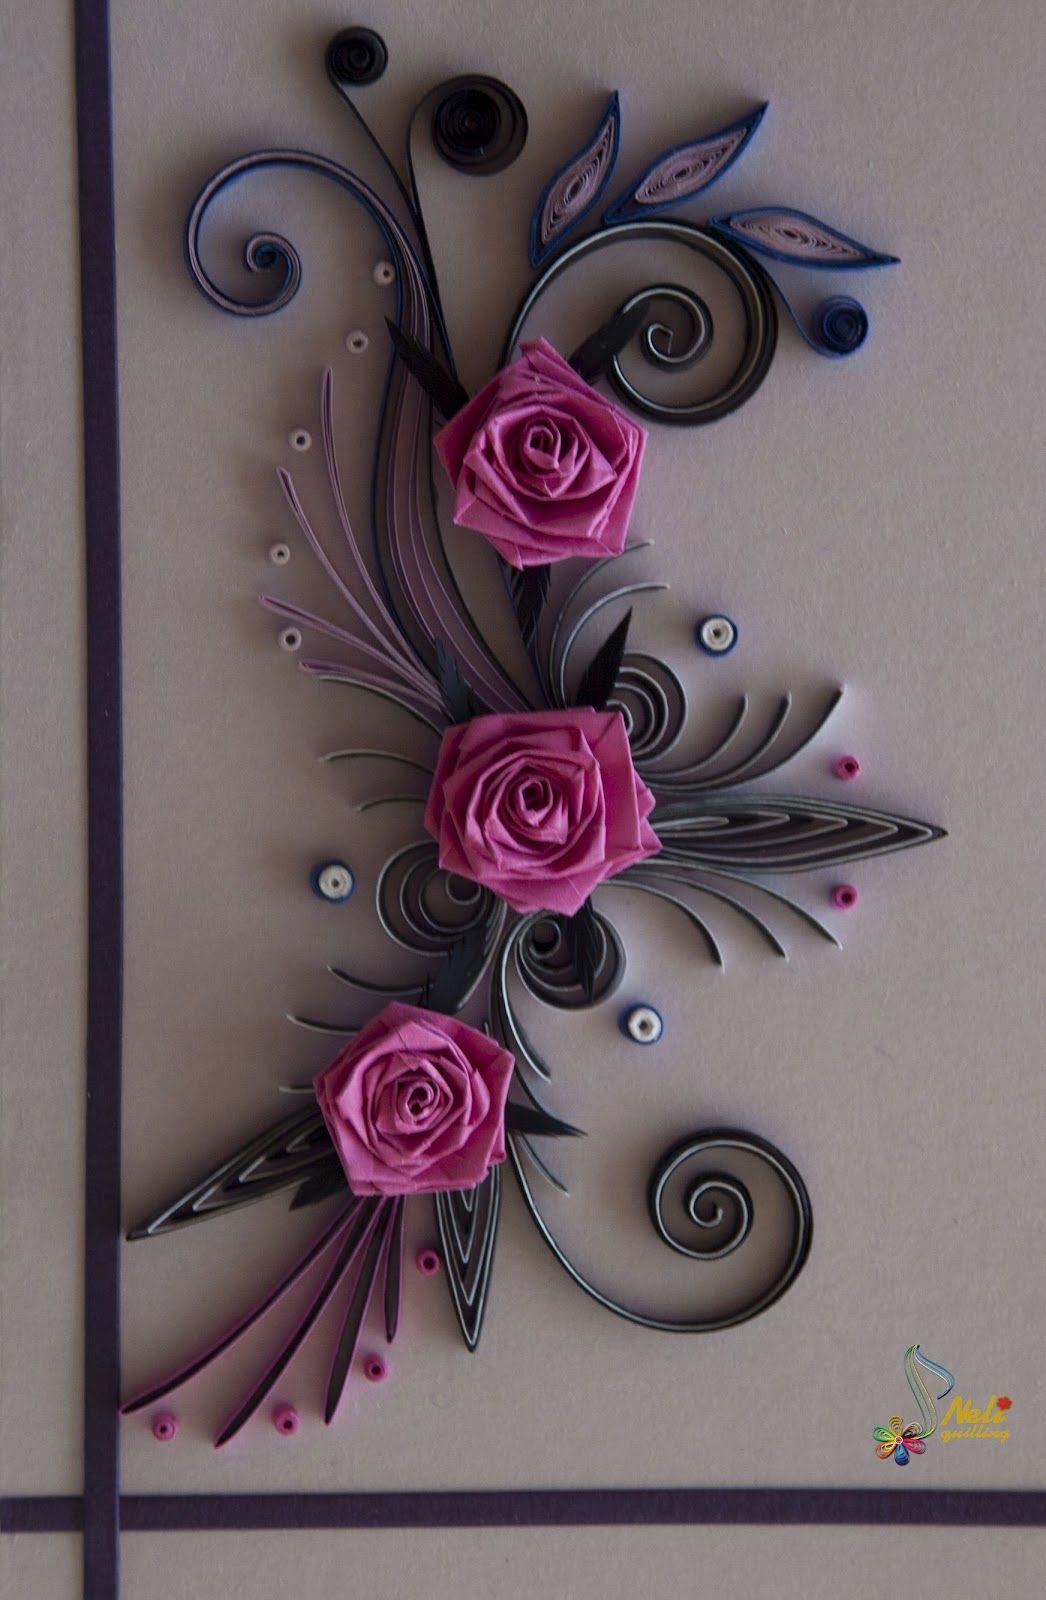 Neli quilling art quilling card purple flowers - Neli Quilling Art Quilling Cards Roses Things I Want